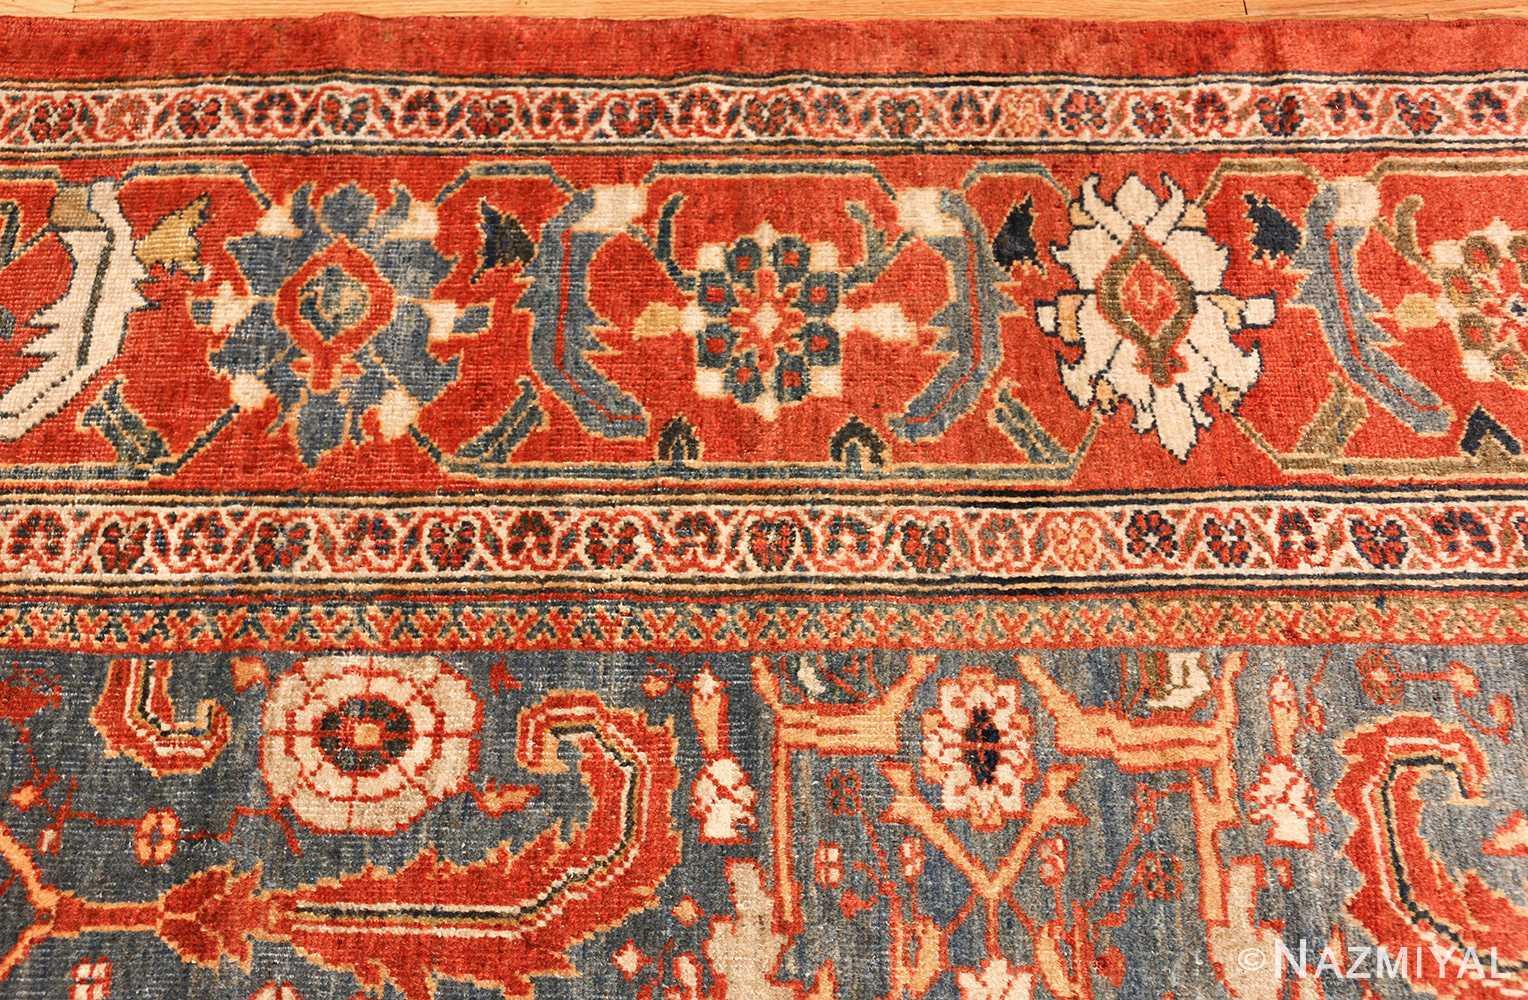 large blue background sultanabad persian rug 49300 border Nazmiyal